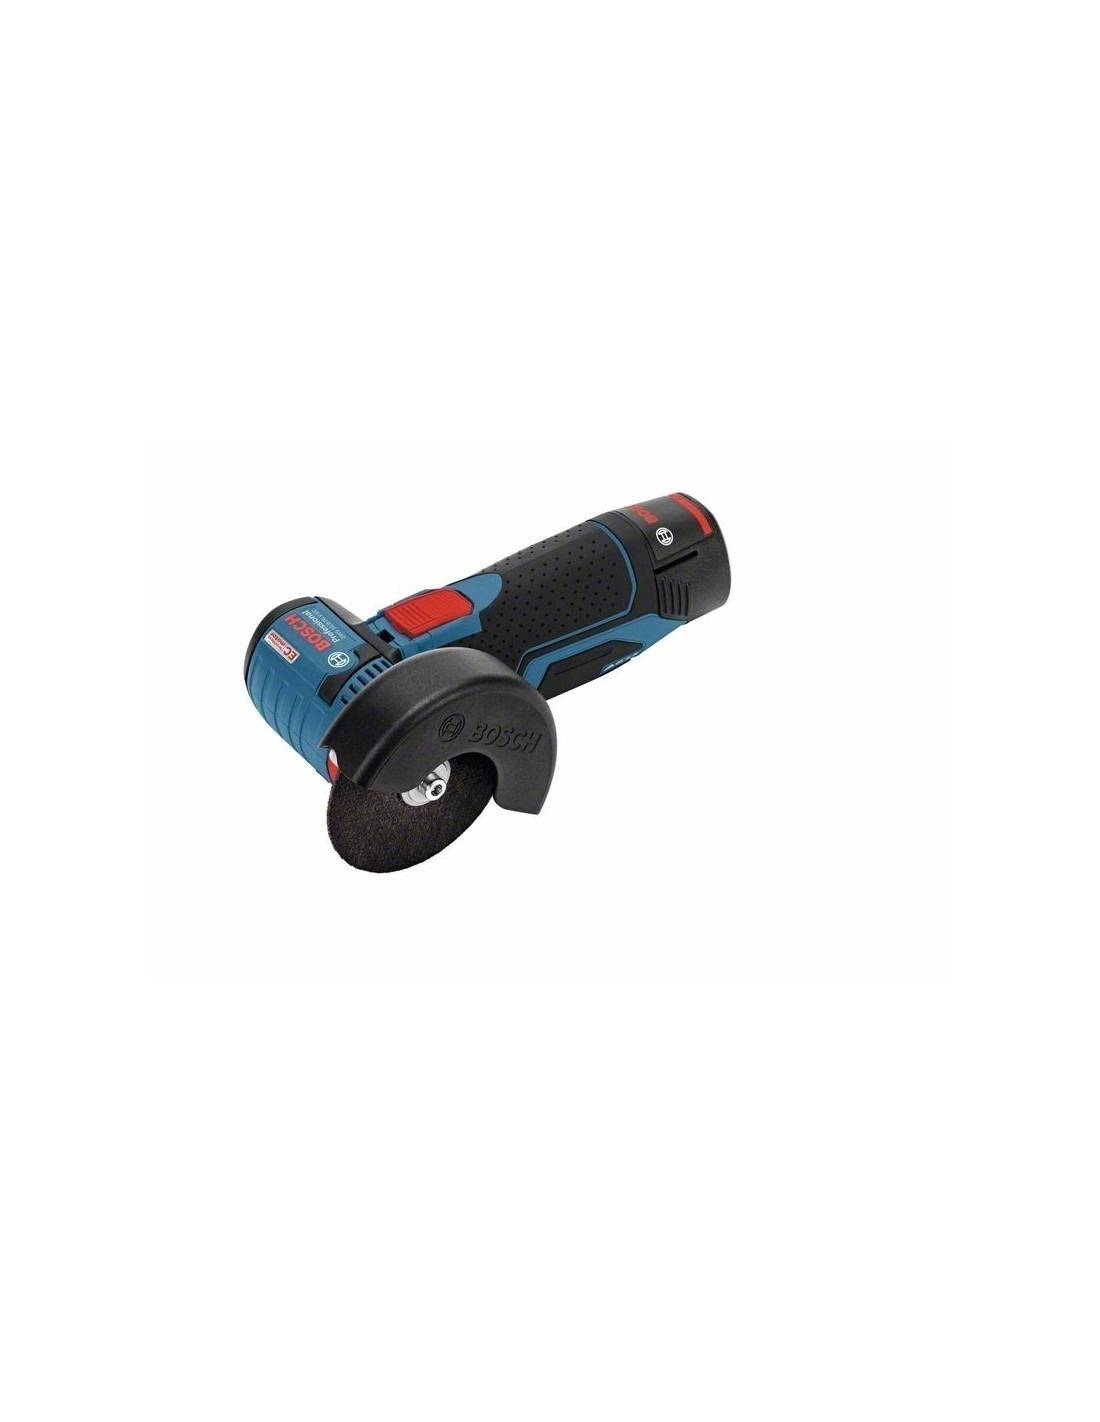 4fa904a8831369 Meuleuse sans fil GWS 12V-76 solo Click Go, L-BOXX - Bosch pas cher